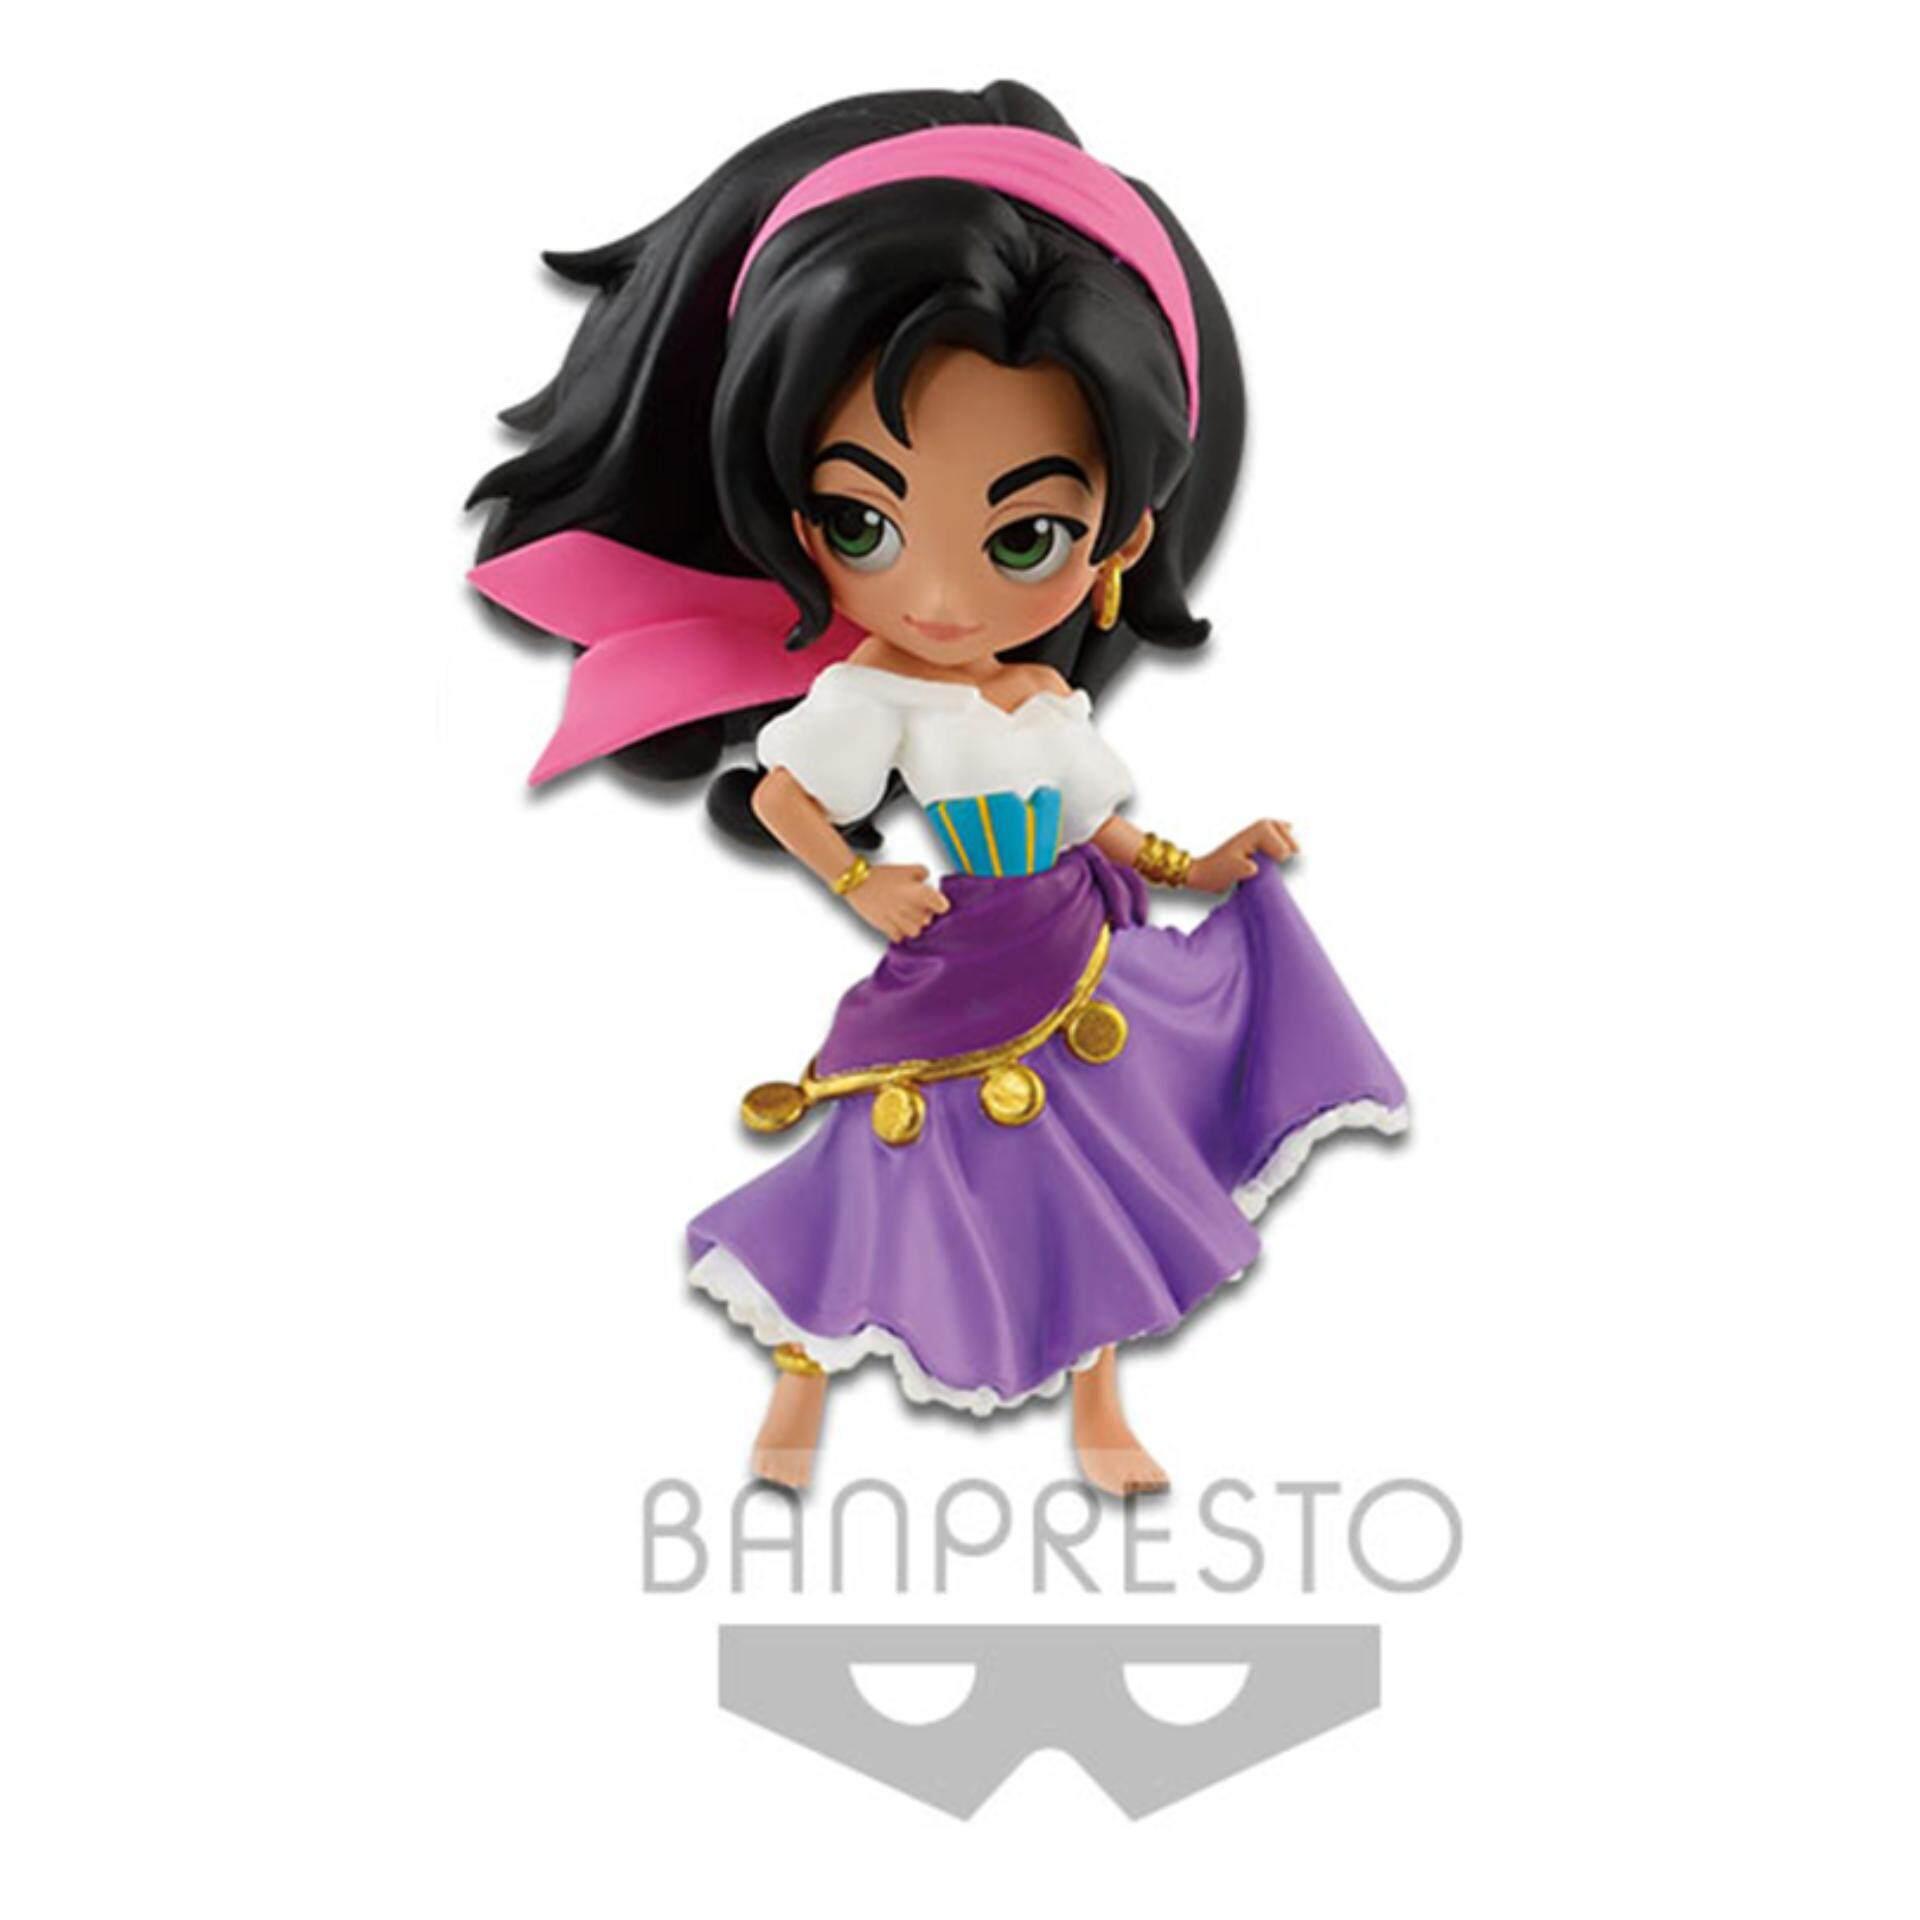 Banpresto Q Posket Disney Princess Petit Figure - Esmeralda Toys for boys